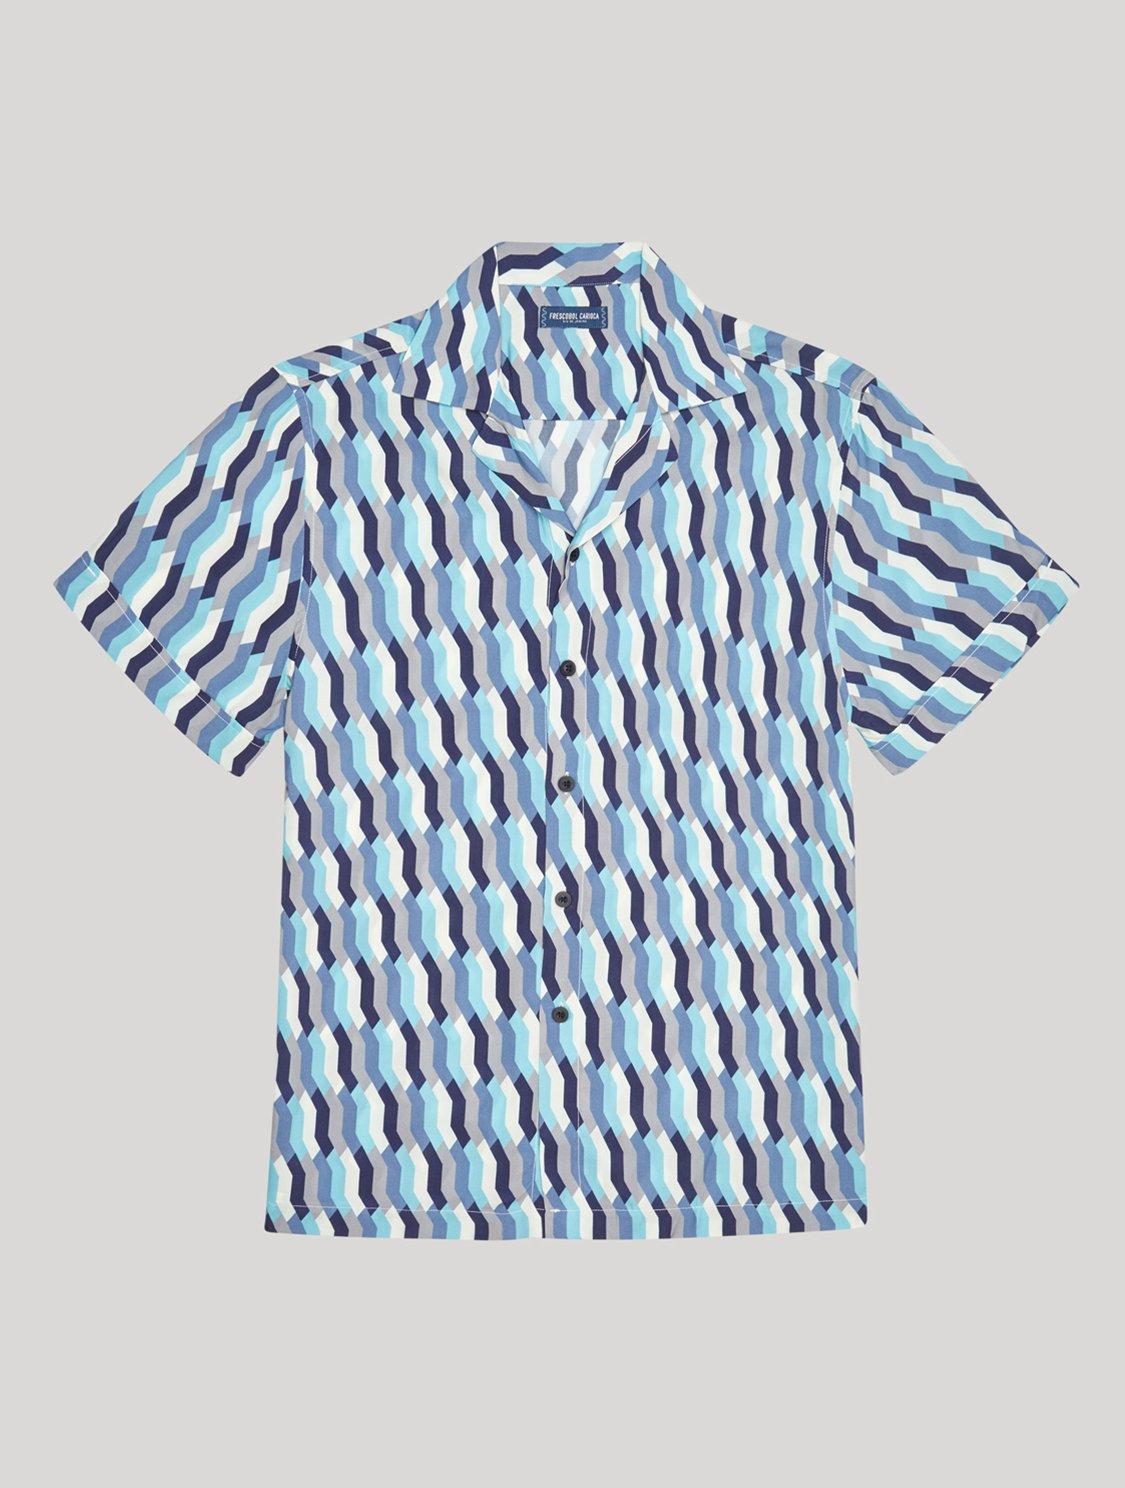 Roberto Shirt Mosaique Print Navy-Blue M